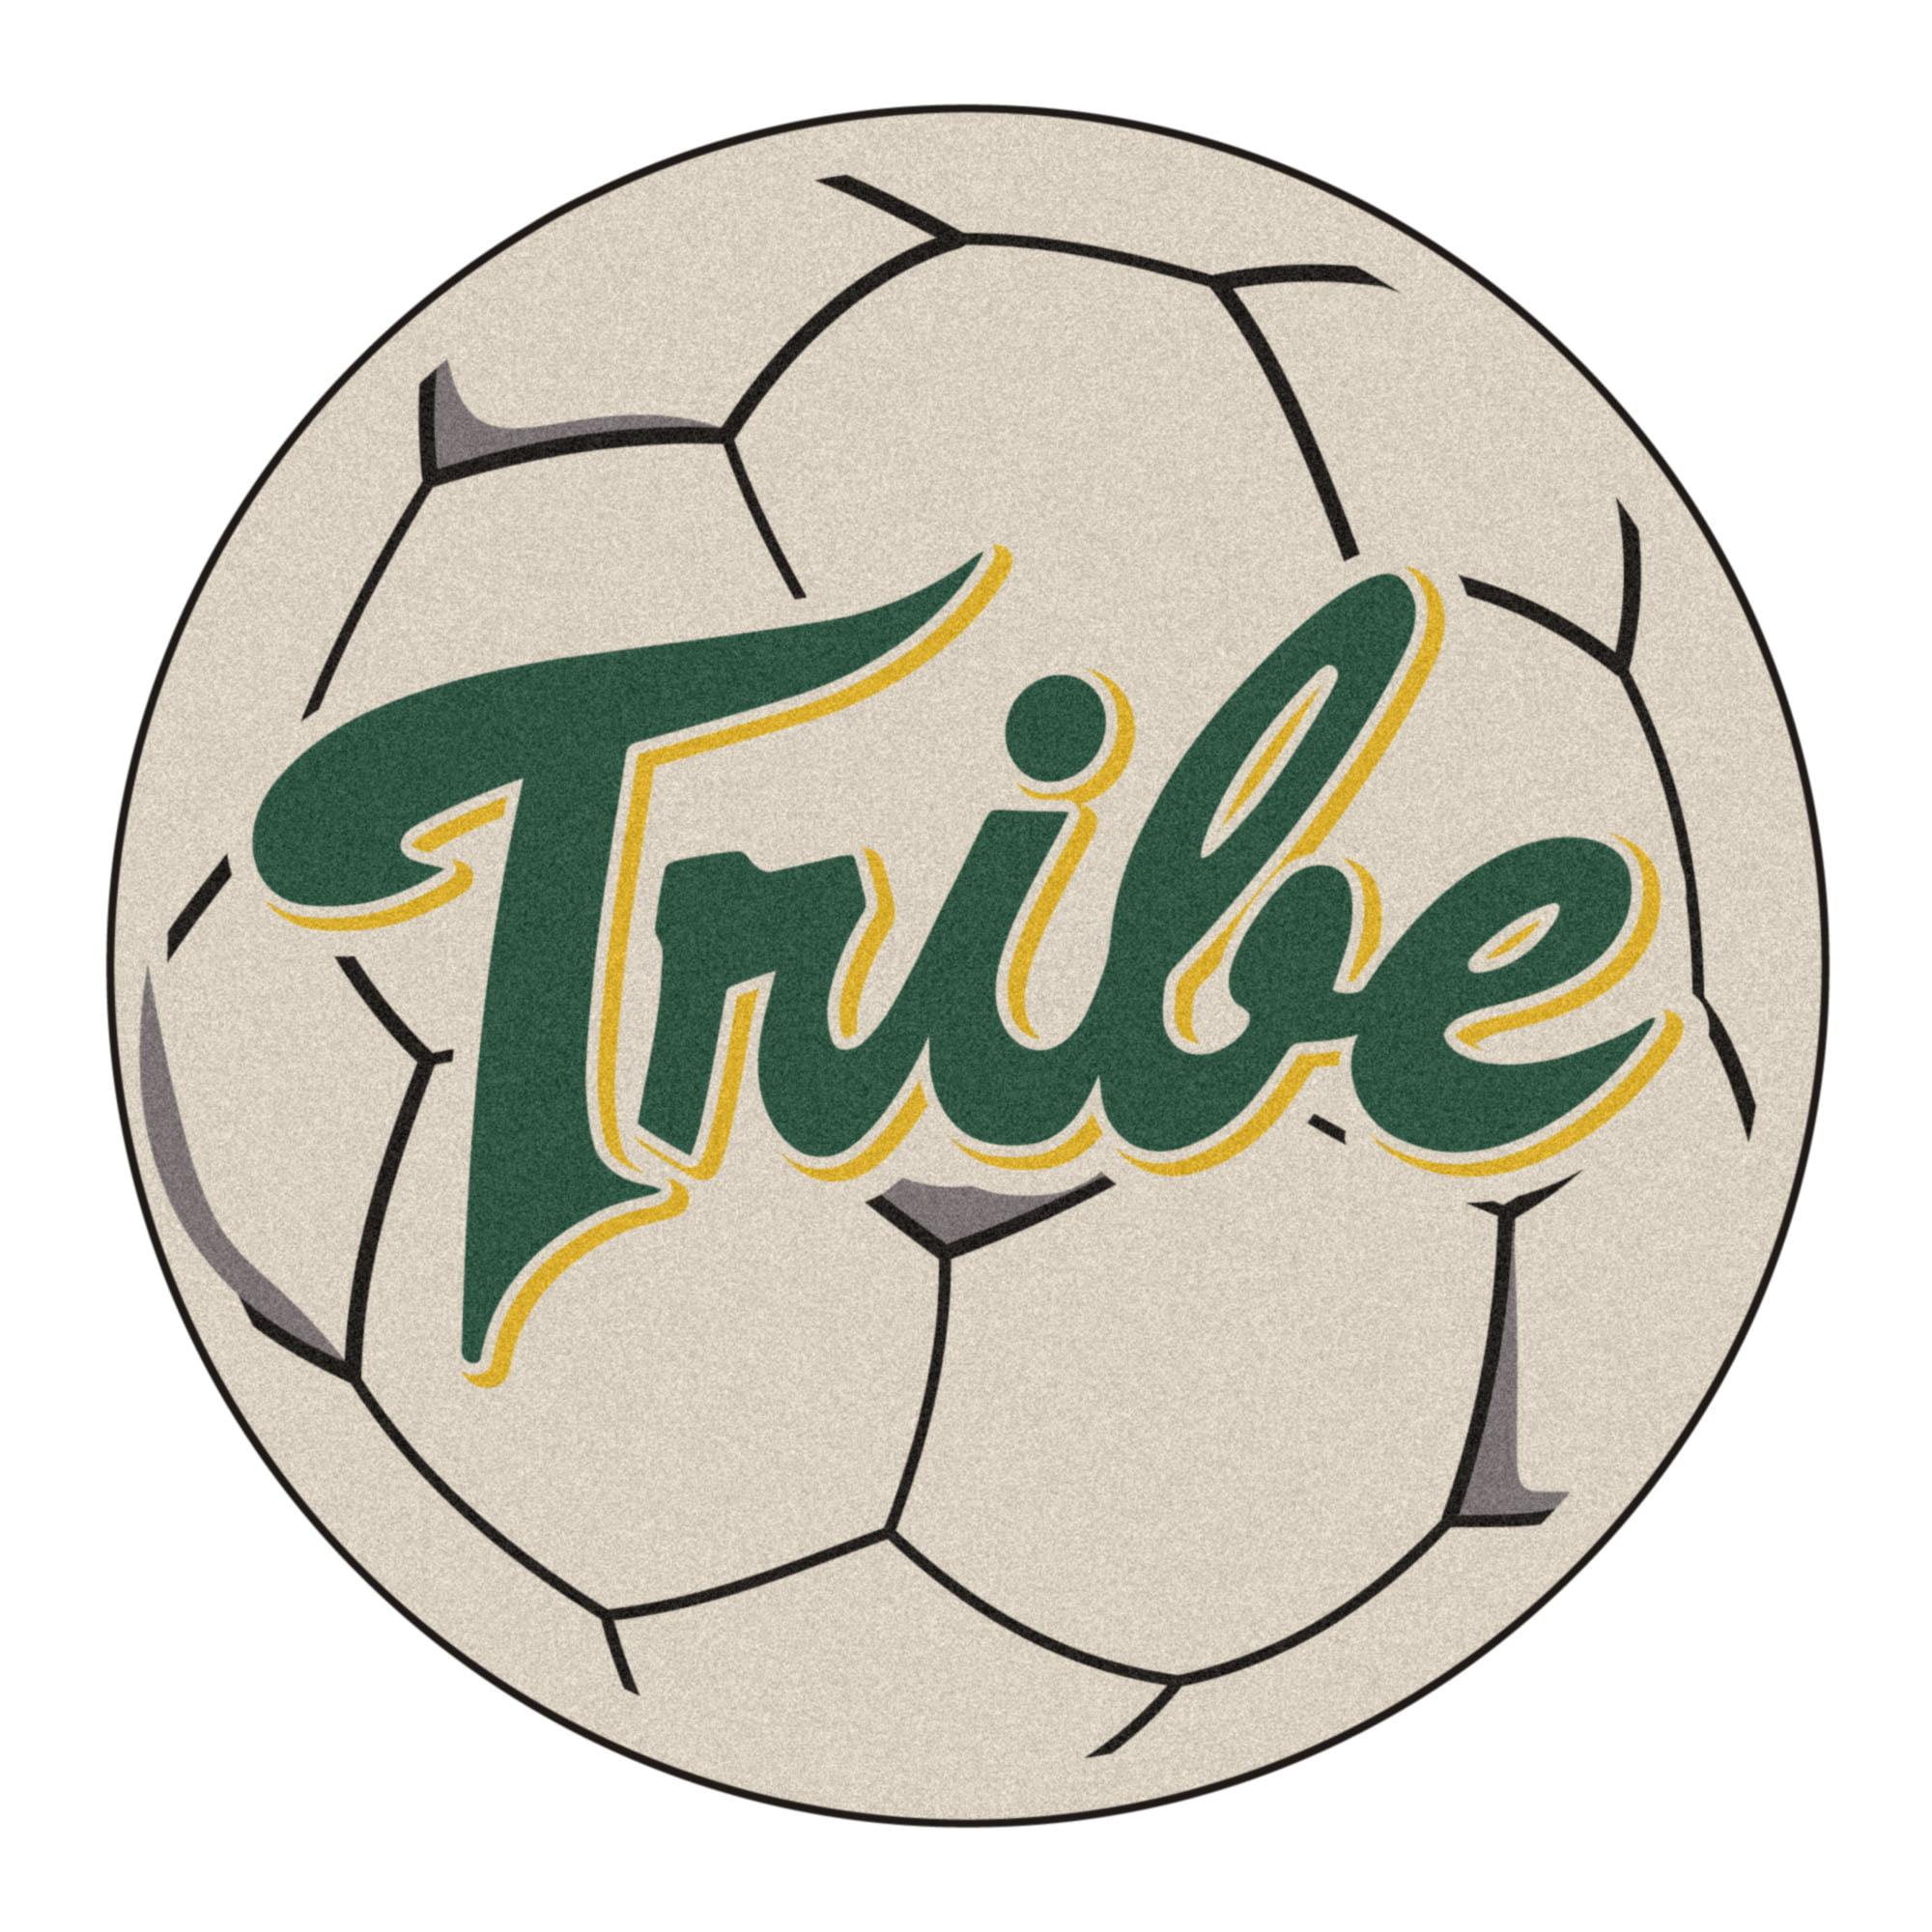 "William & Mary Soccer Ball 27"" diameter"